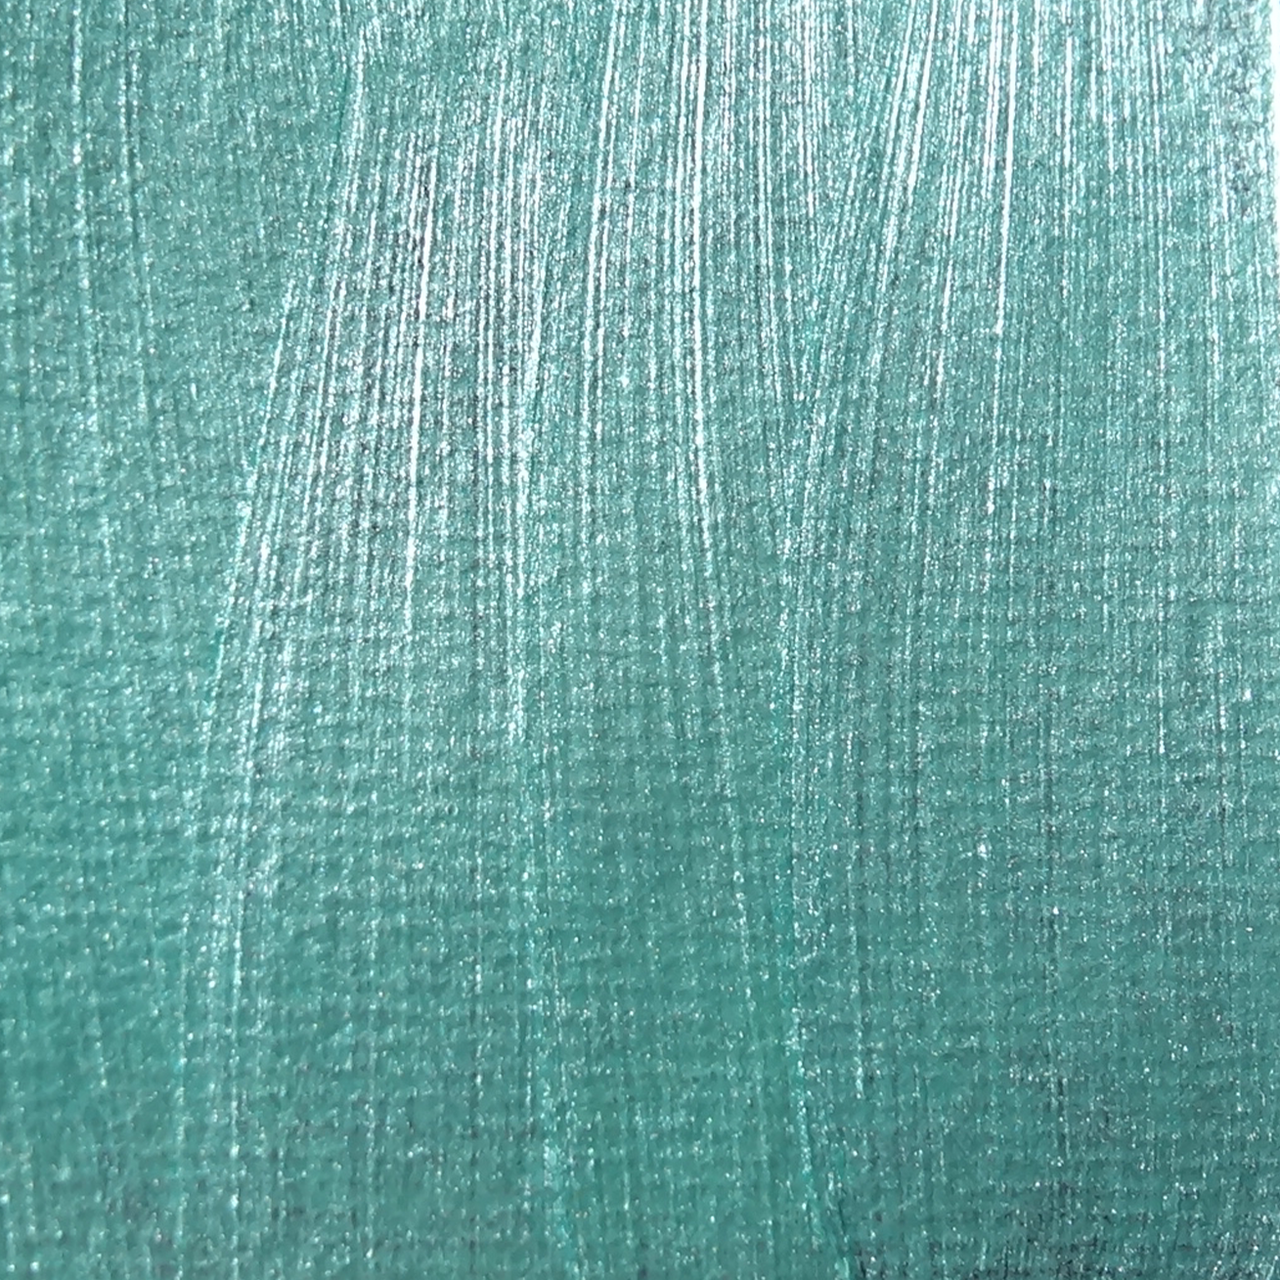 Декоративная краска, Pearl and Metallic, амазонит, 50 мл, ScrapEgo